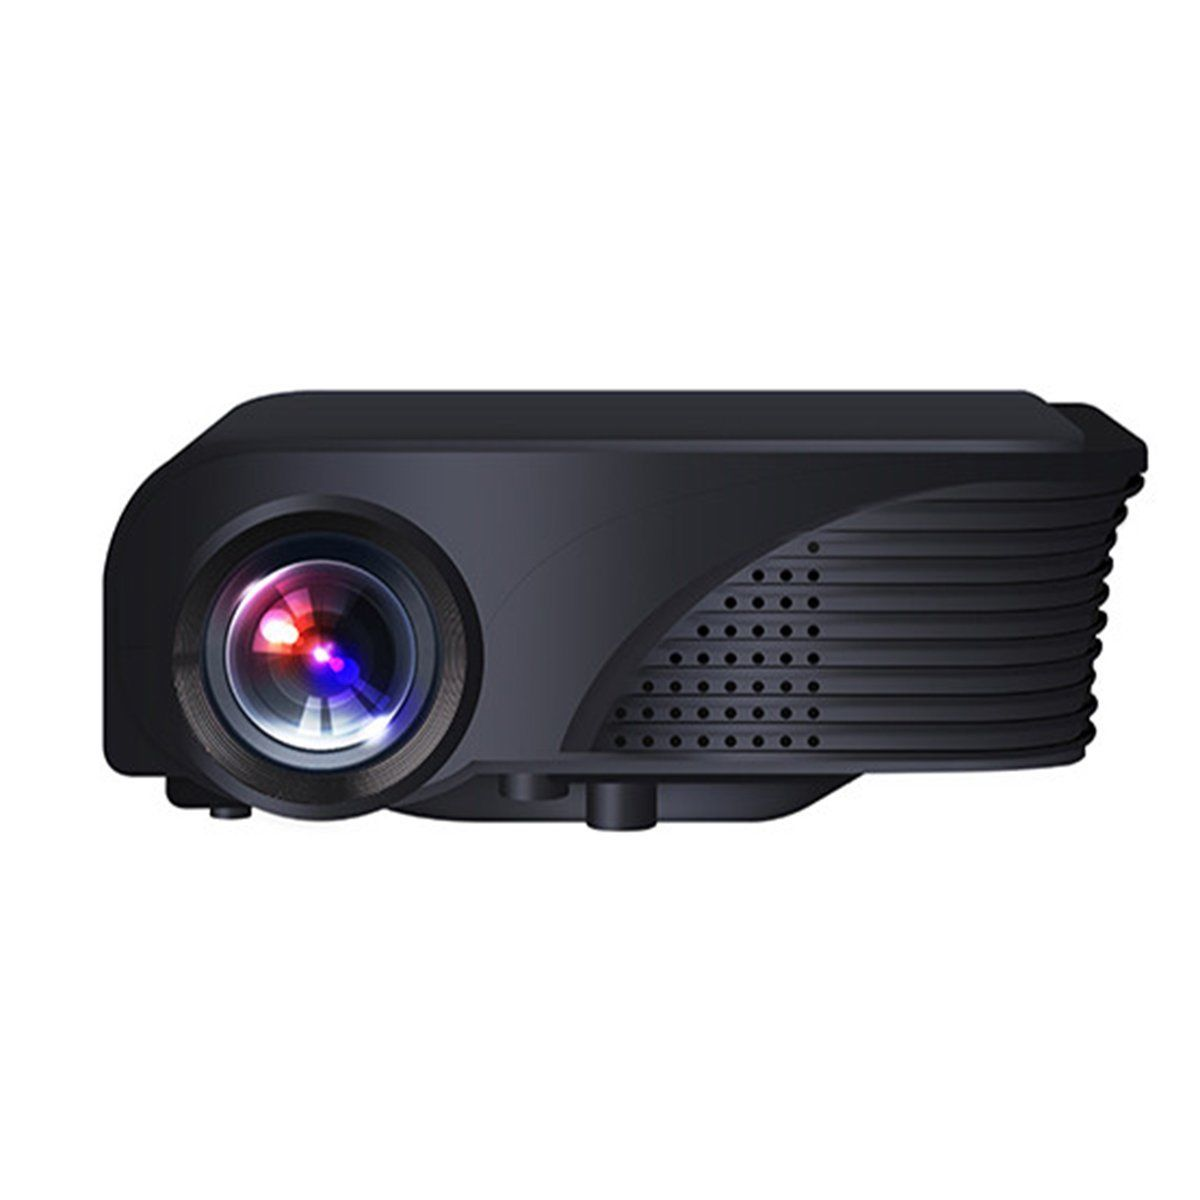 Portable s320 mini 1800 1800 lumens hd 1080p video for Hd video projector